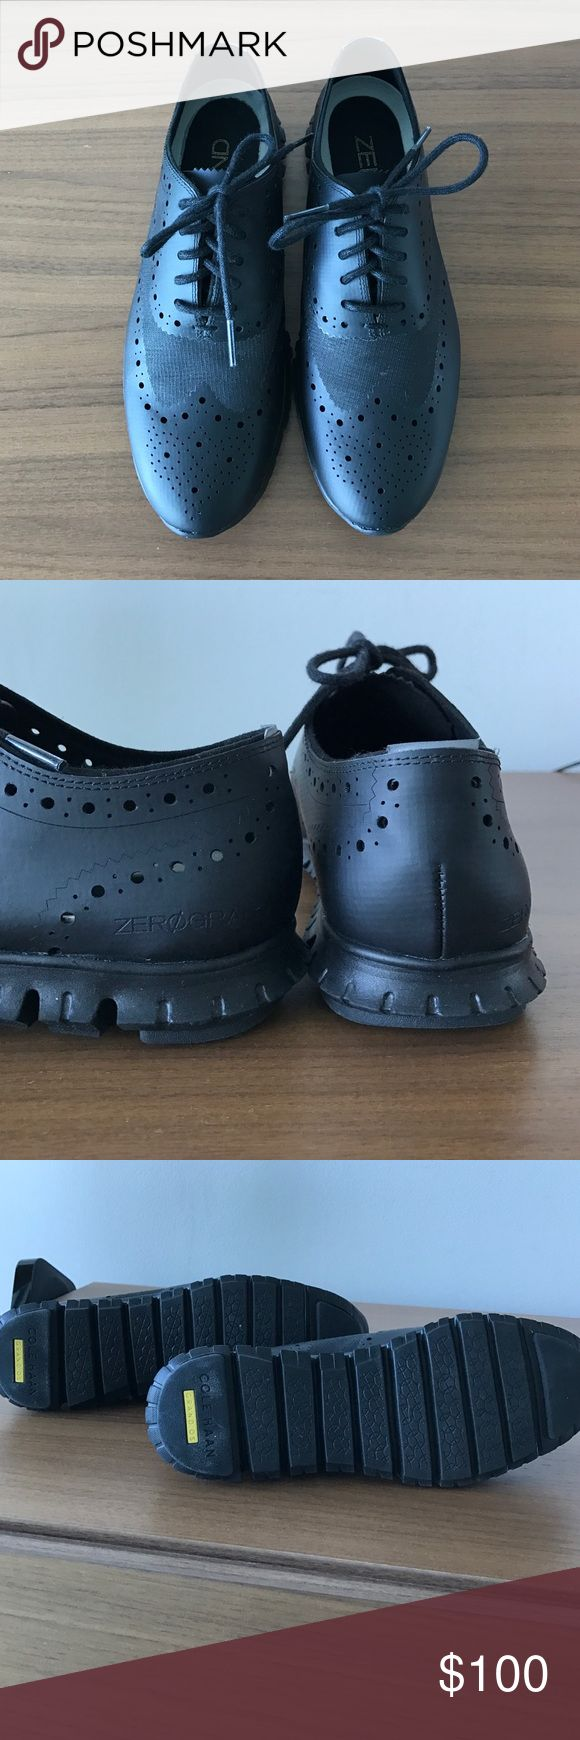 Cole Haan Zero Grand sneakers Wore once black Cole Haan Zero-Grand sneakers. Cole Haan Shoes Sneakers